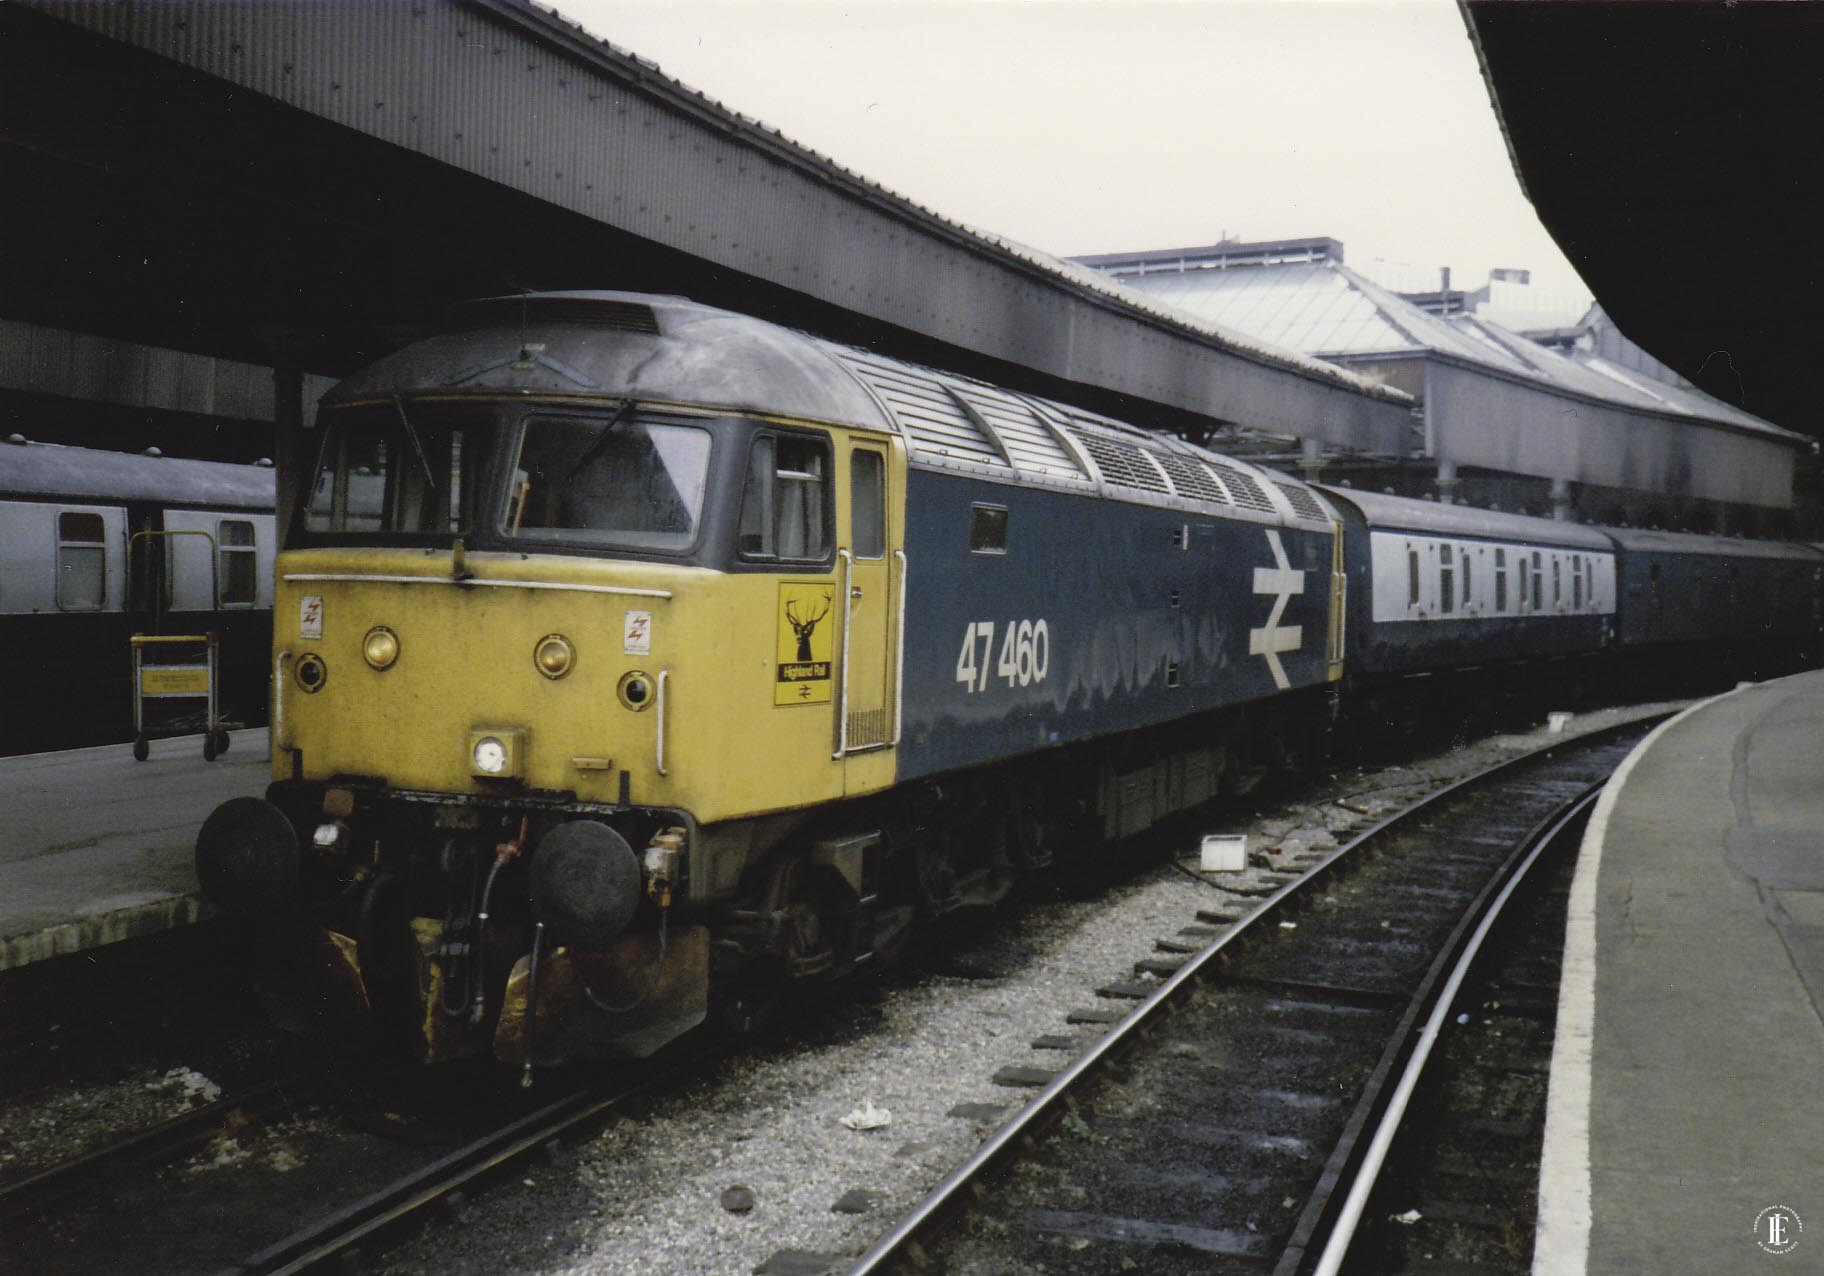 19870820 47460 Newcastle.jpg